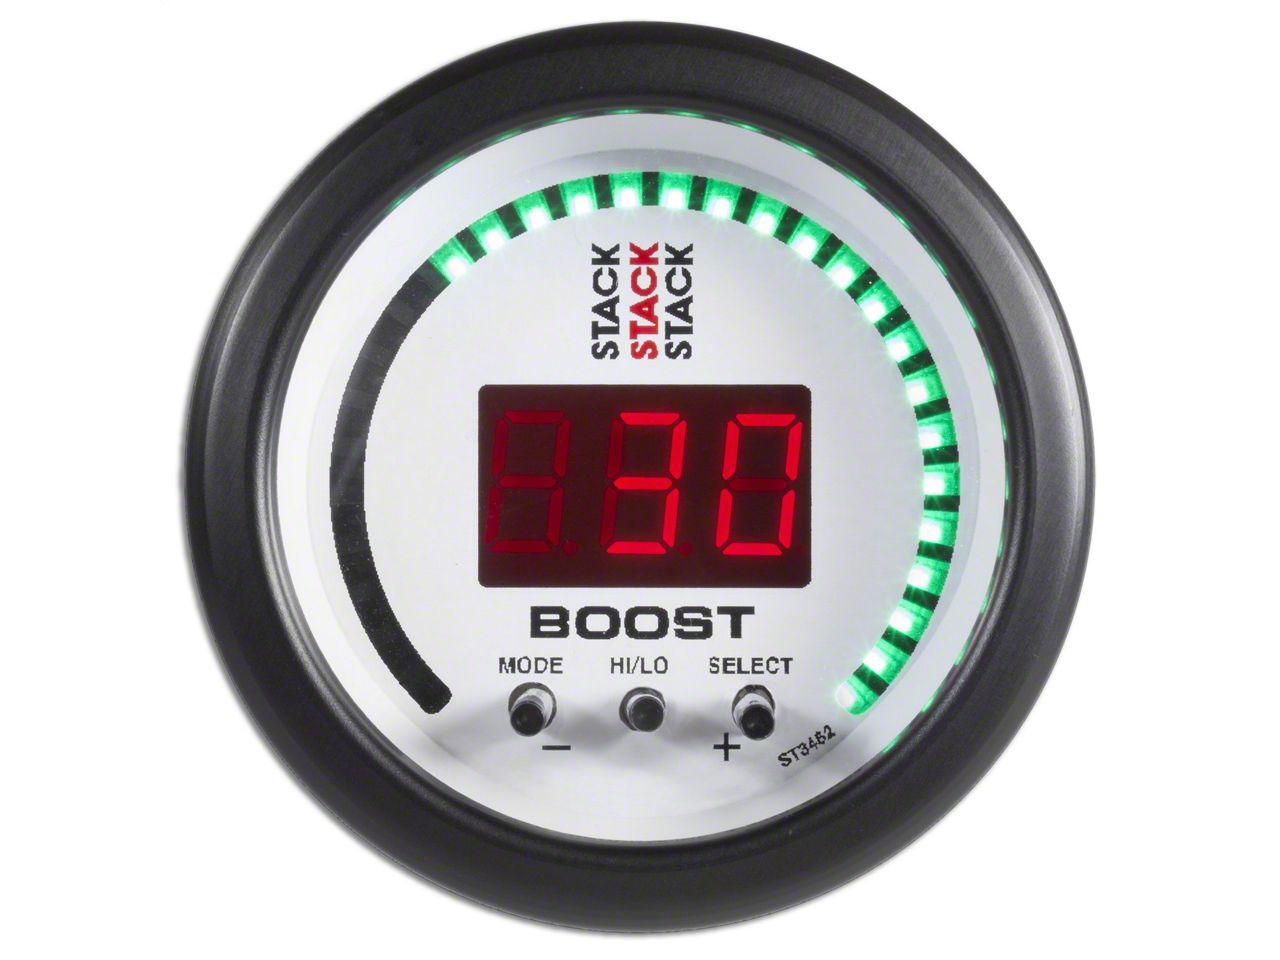 Auto Meter Stack Boost Controller Gauge - White (07-18 Silverado 1500)